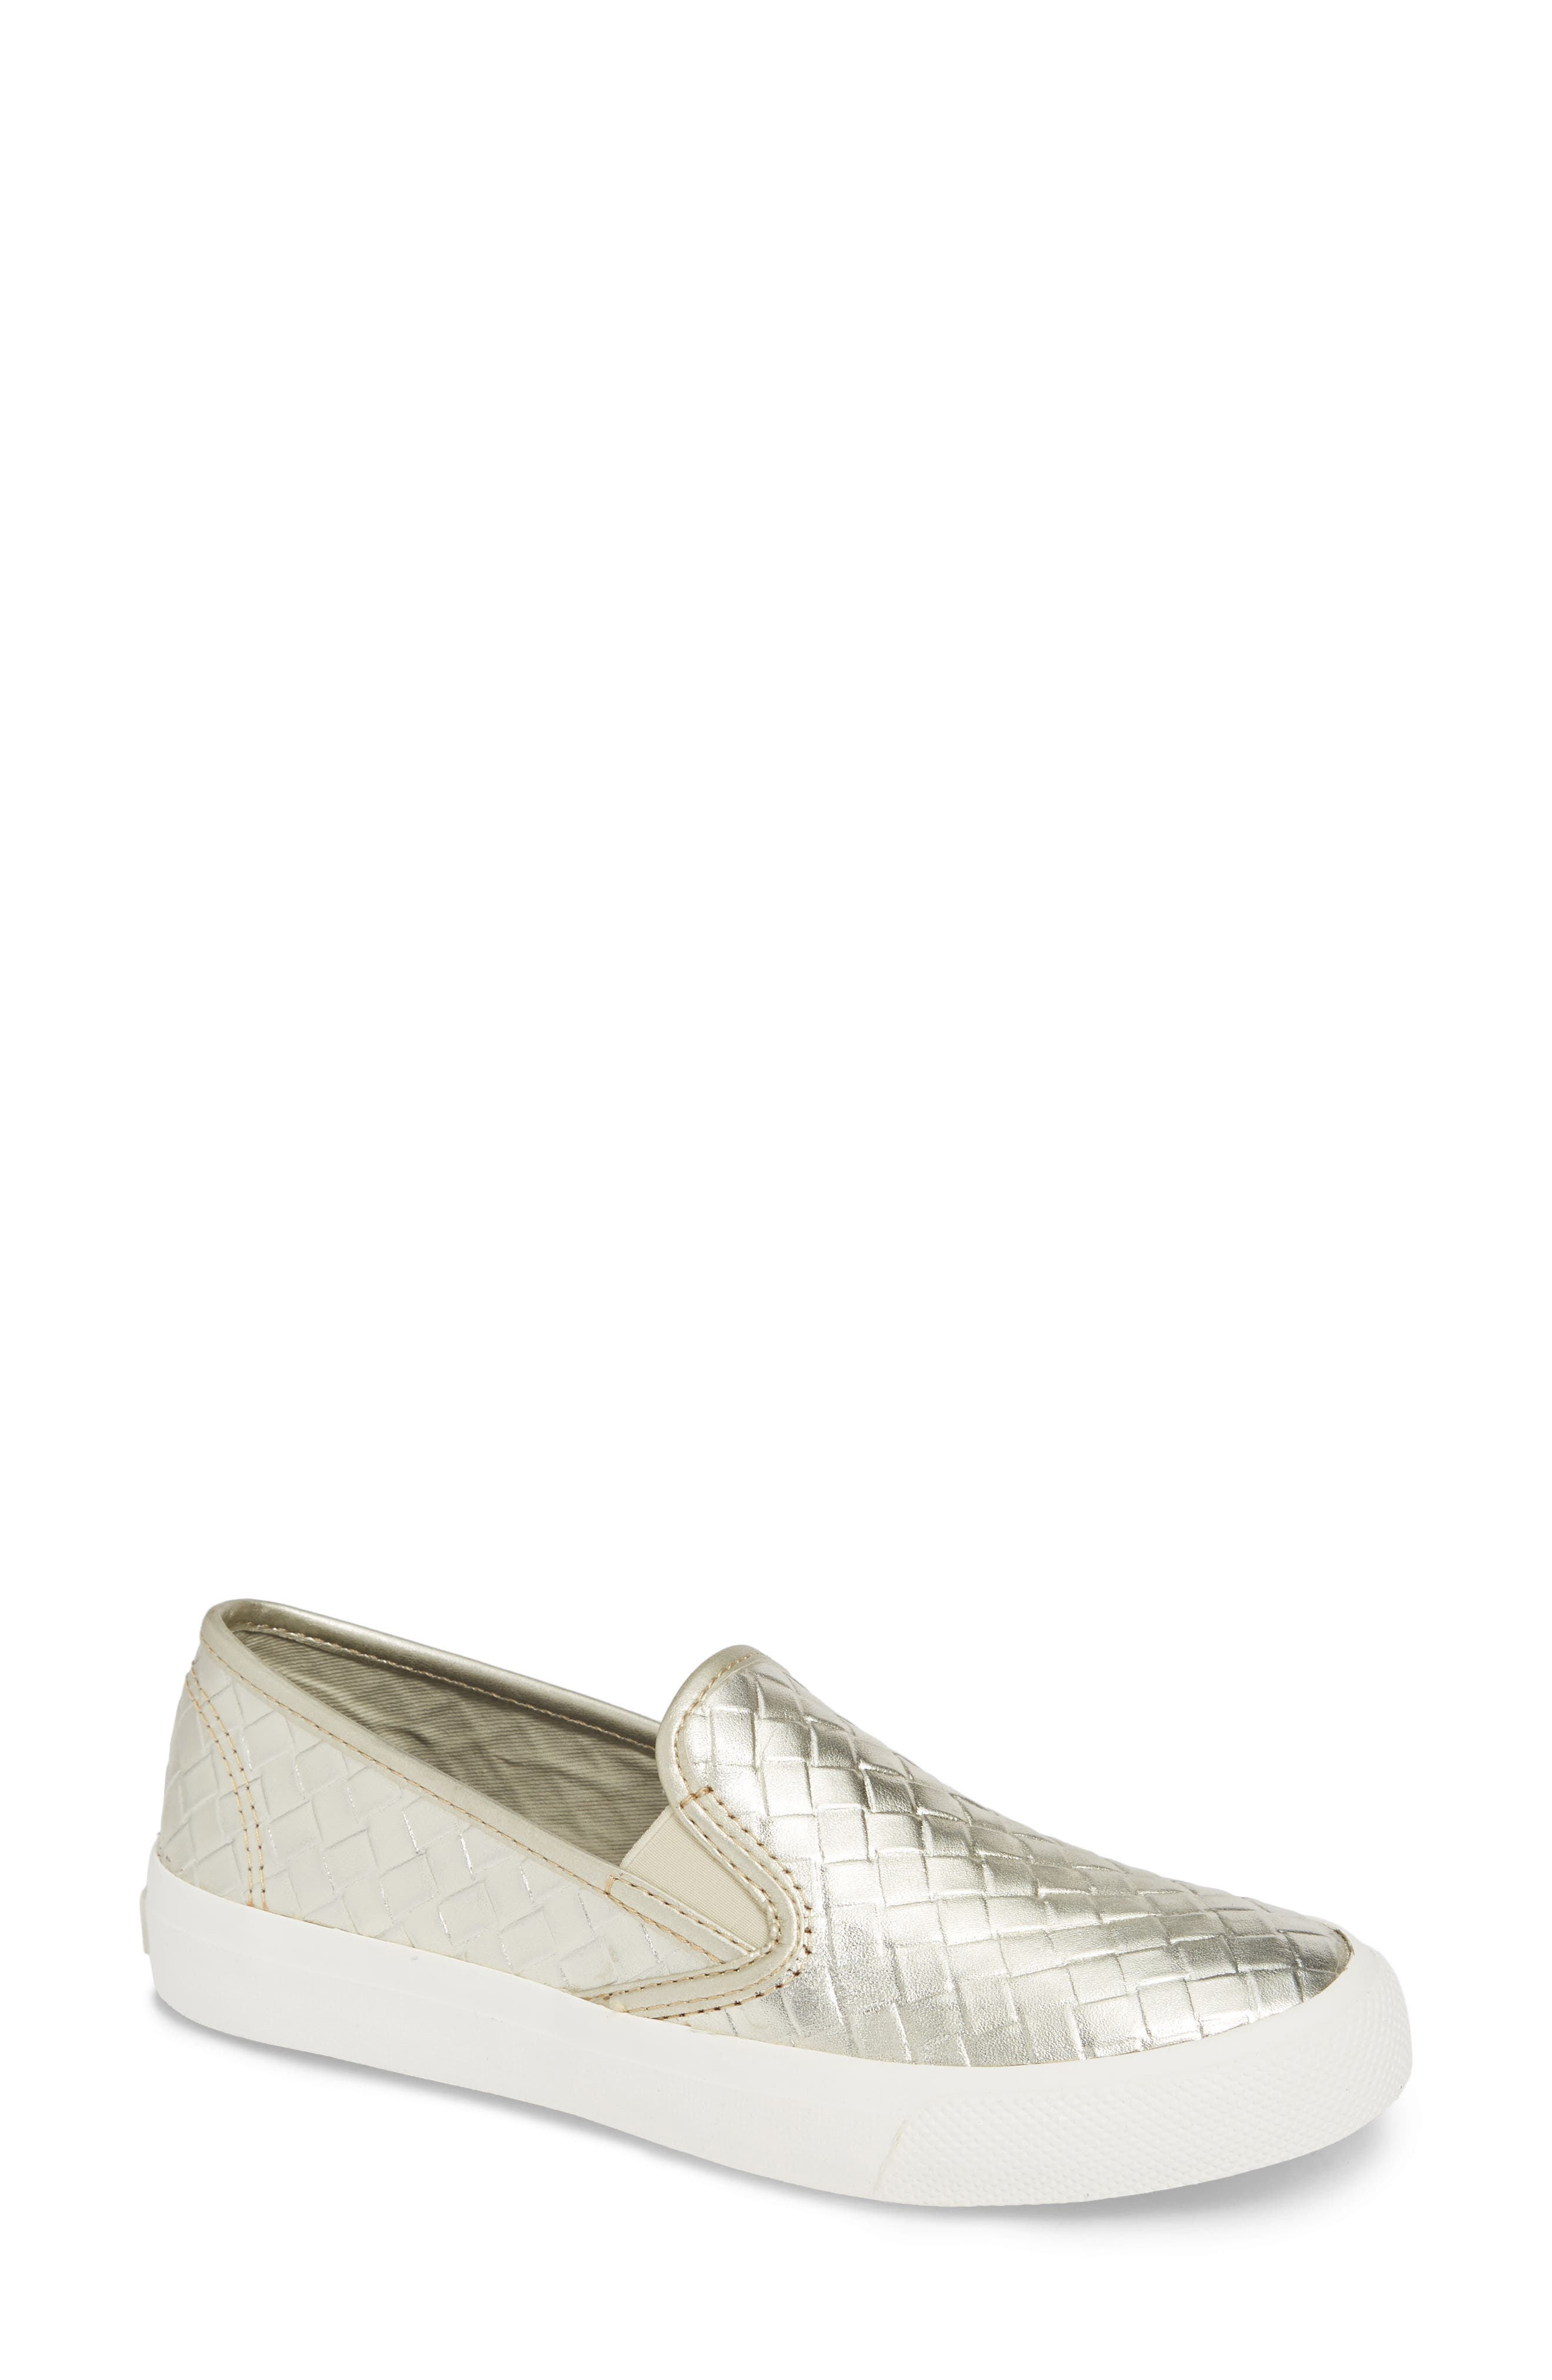 Seaside Embossed Weave Slip-On Sneaker,                         Main,                         color, PLATINUM LEATHER